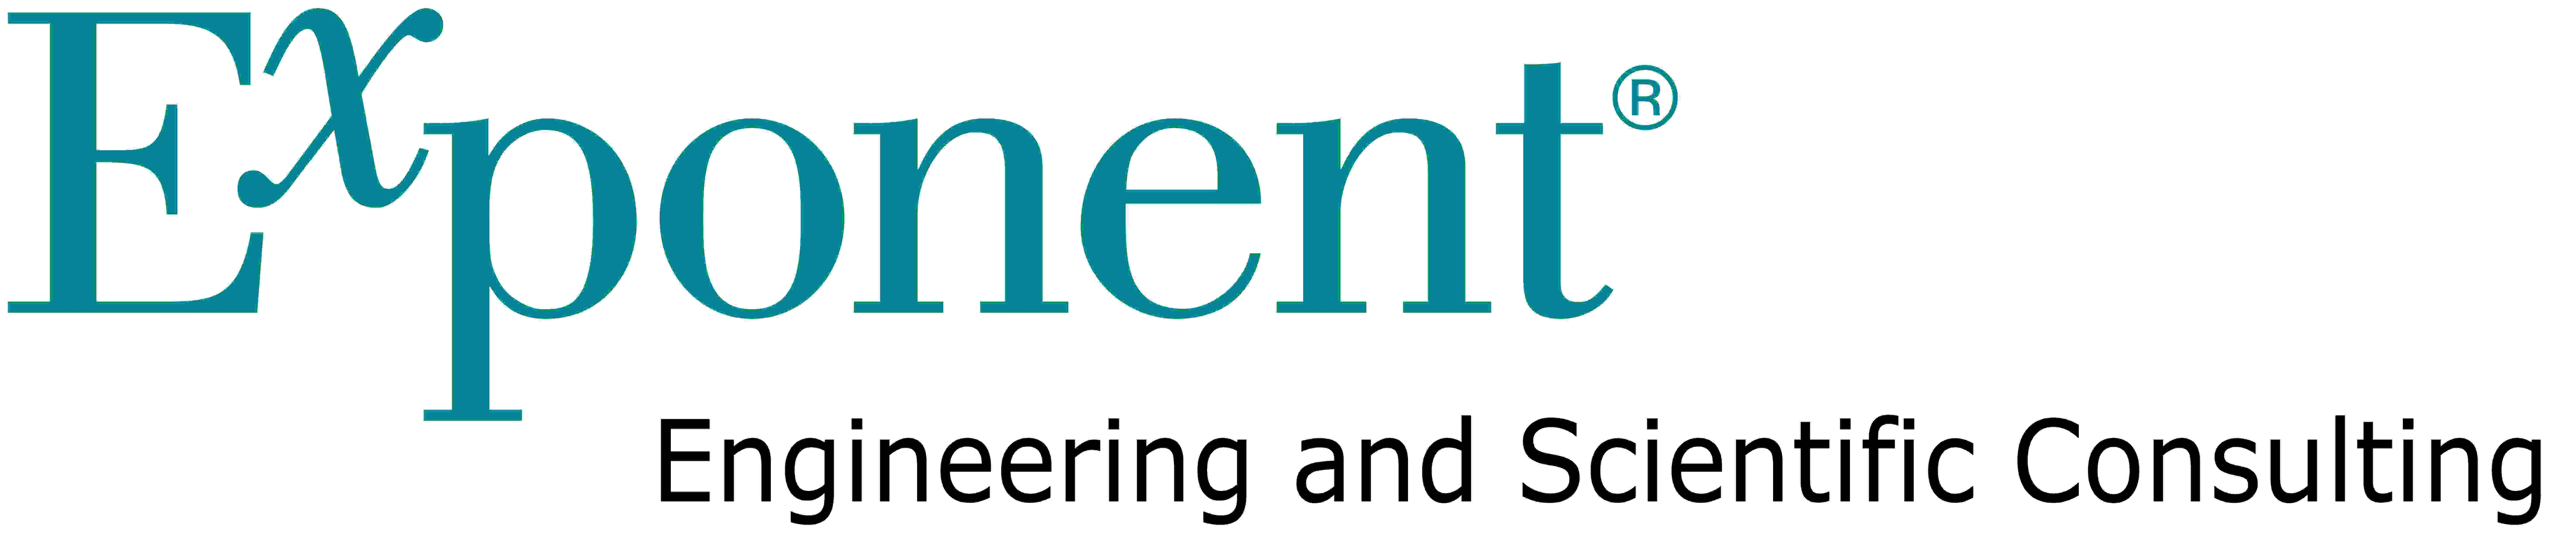 Exponent_EngSci_Logo_hi_res.jpg